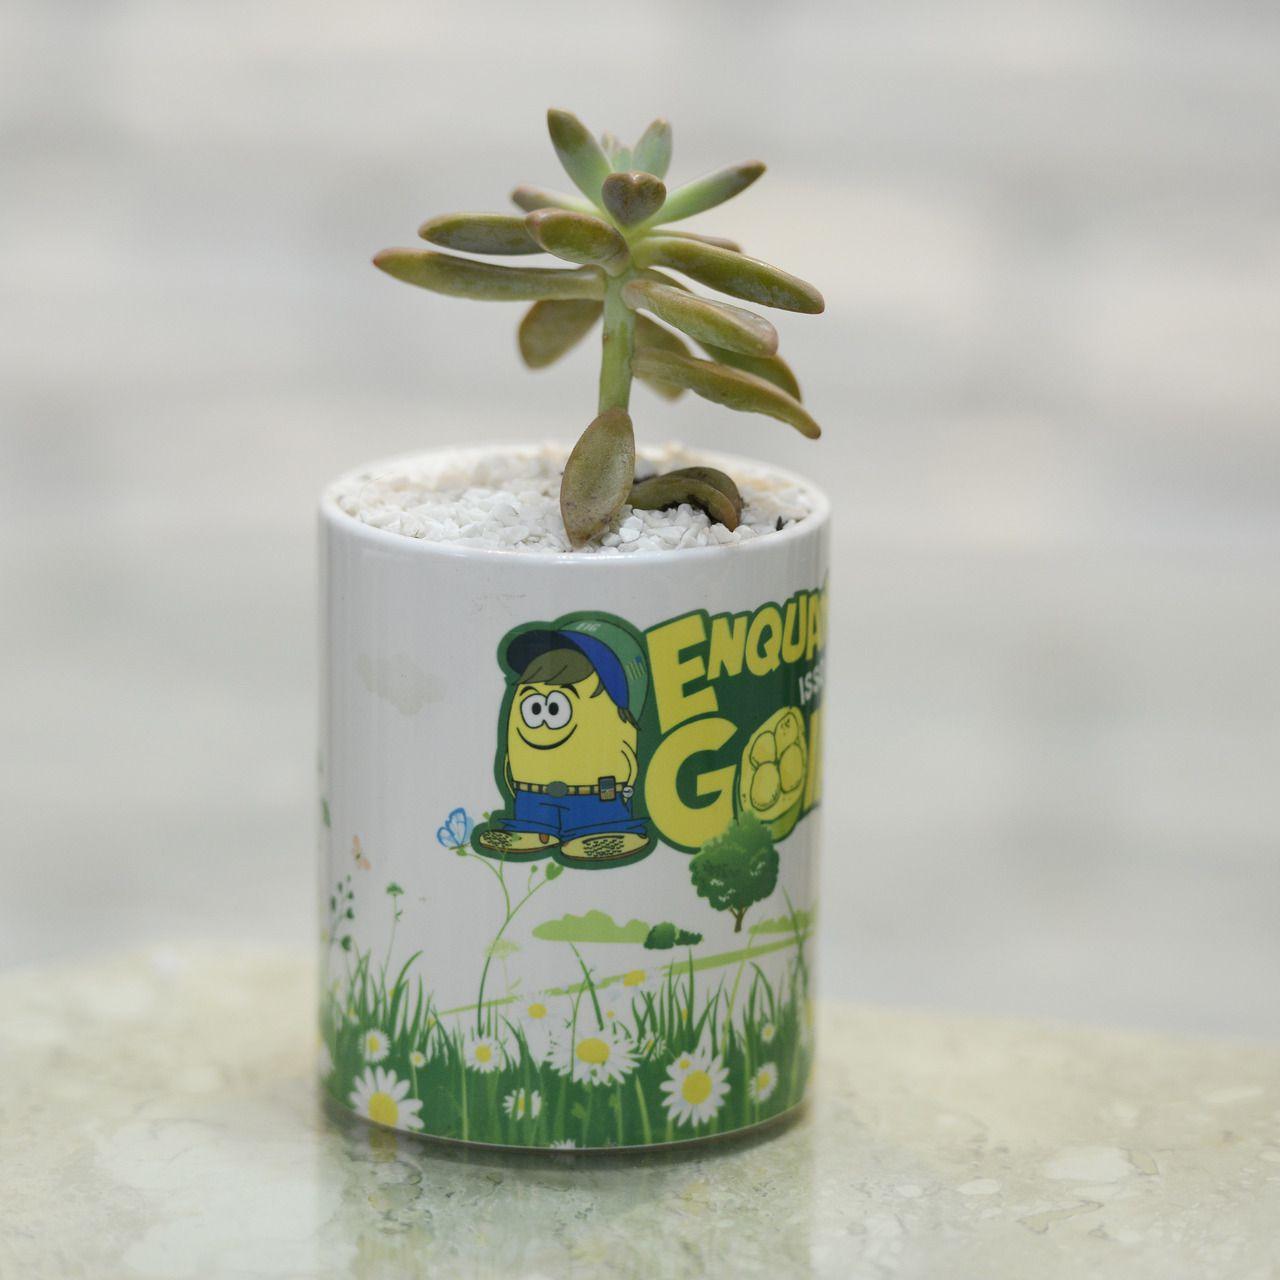 Planta na Caneca - Suculenta